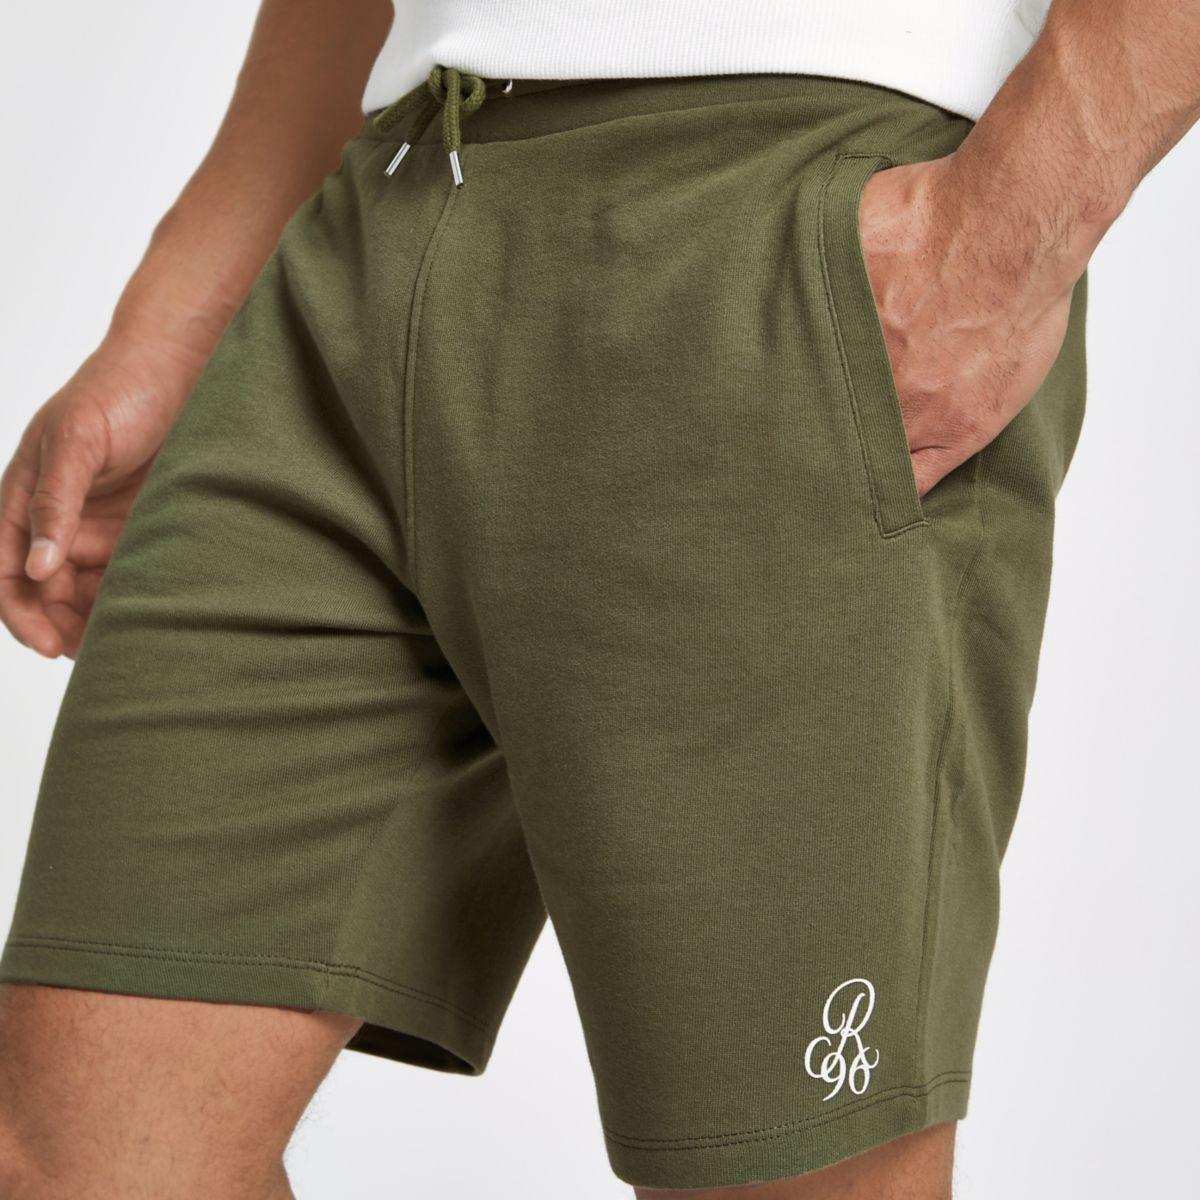 Khaki green embroidered slim fit shorts